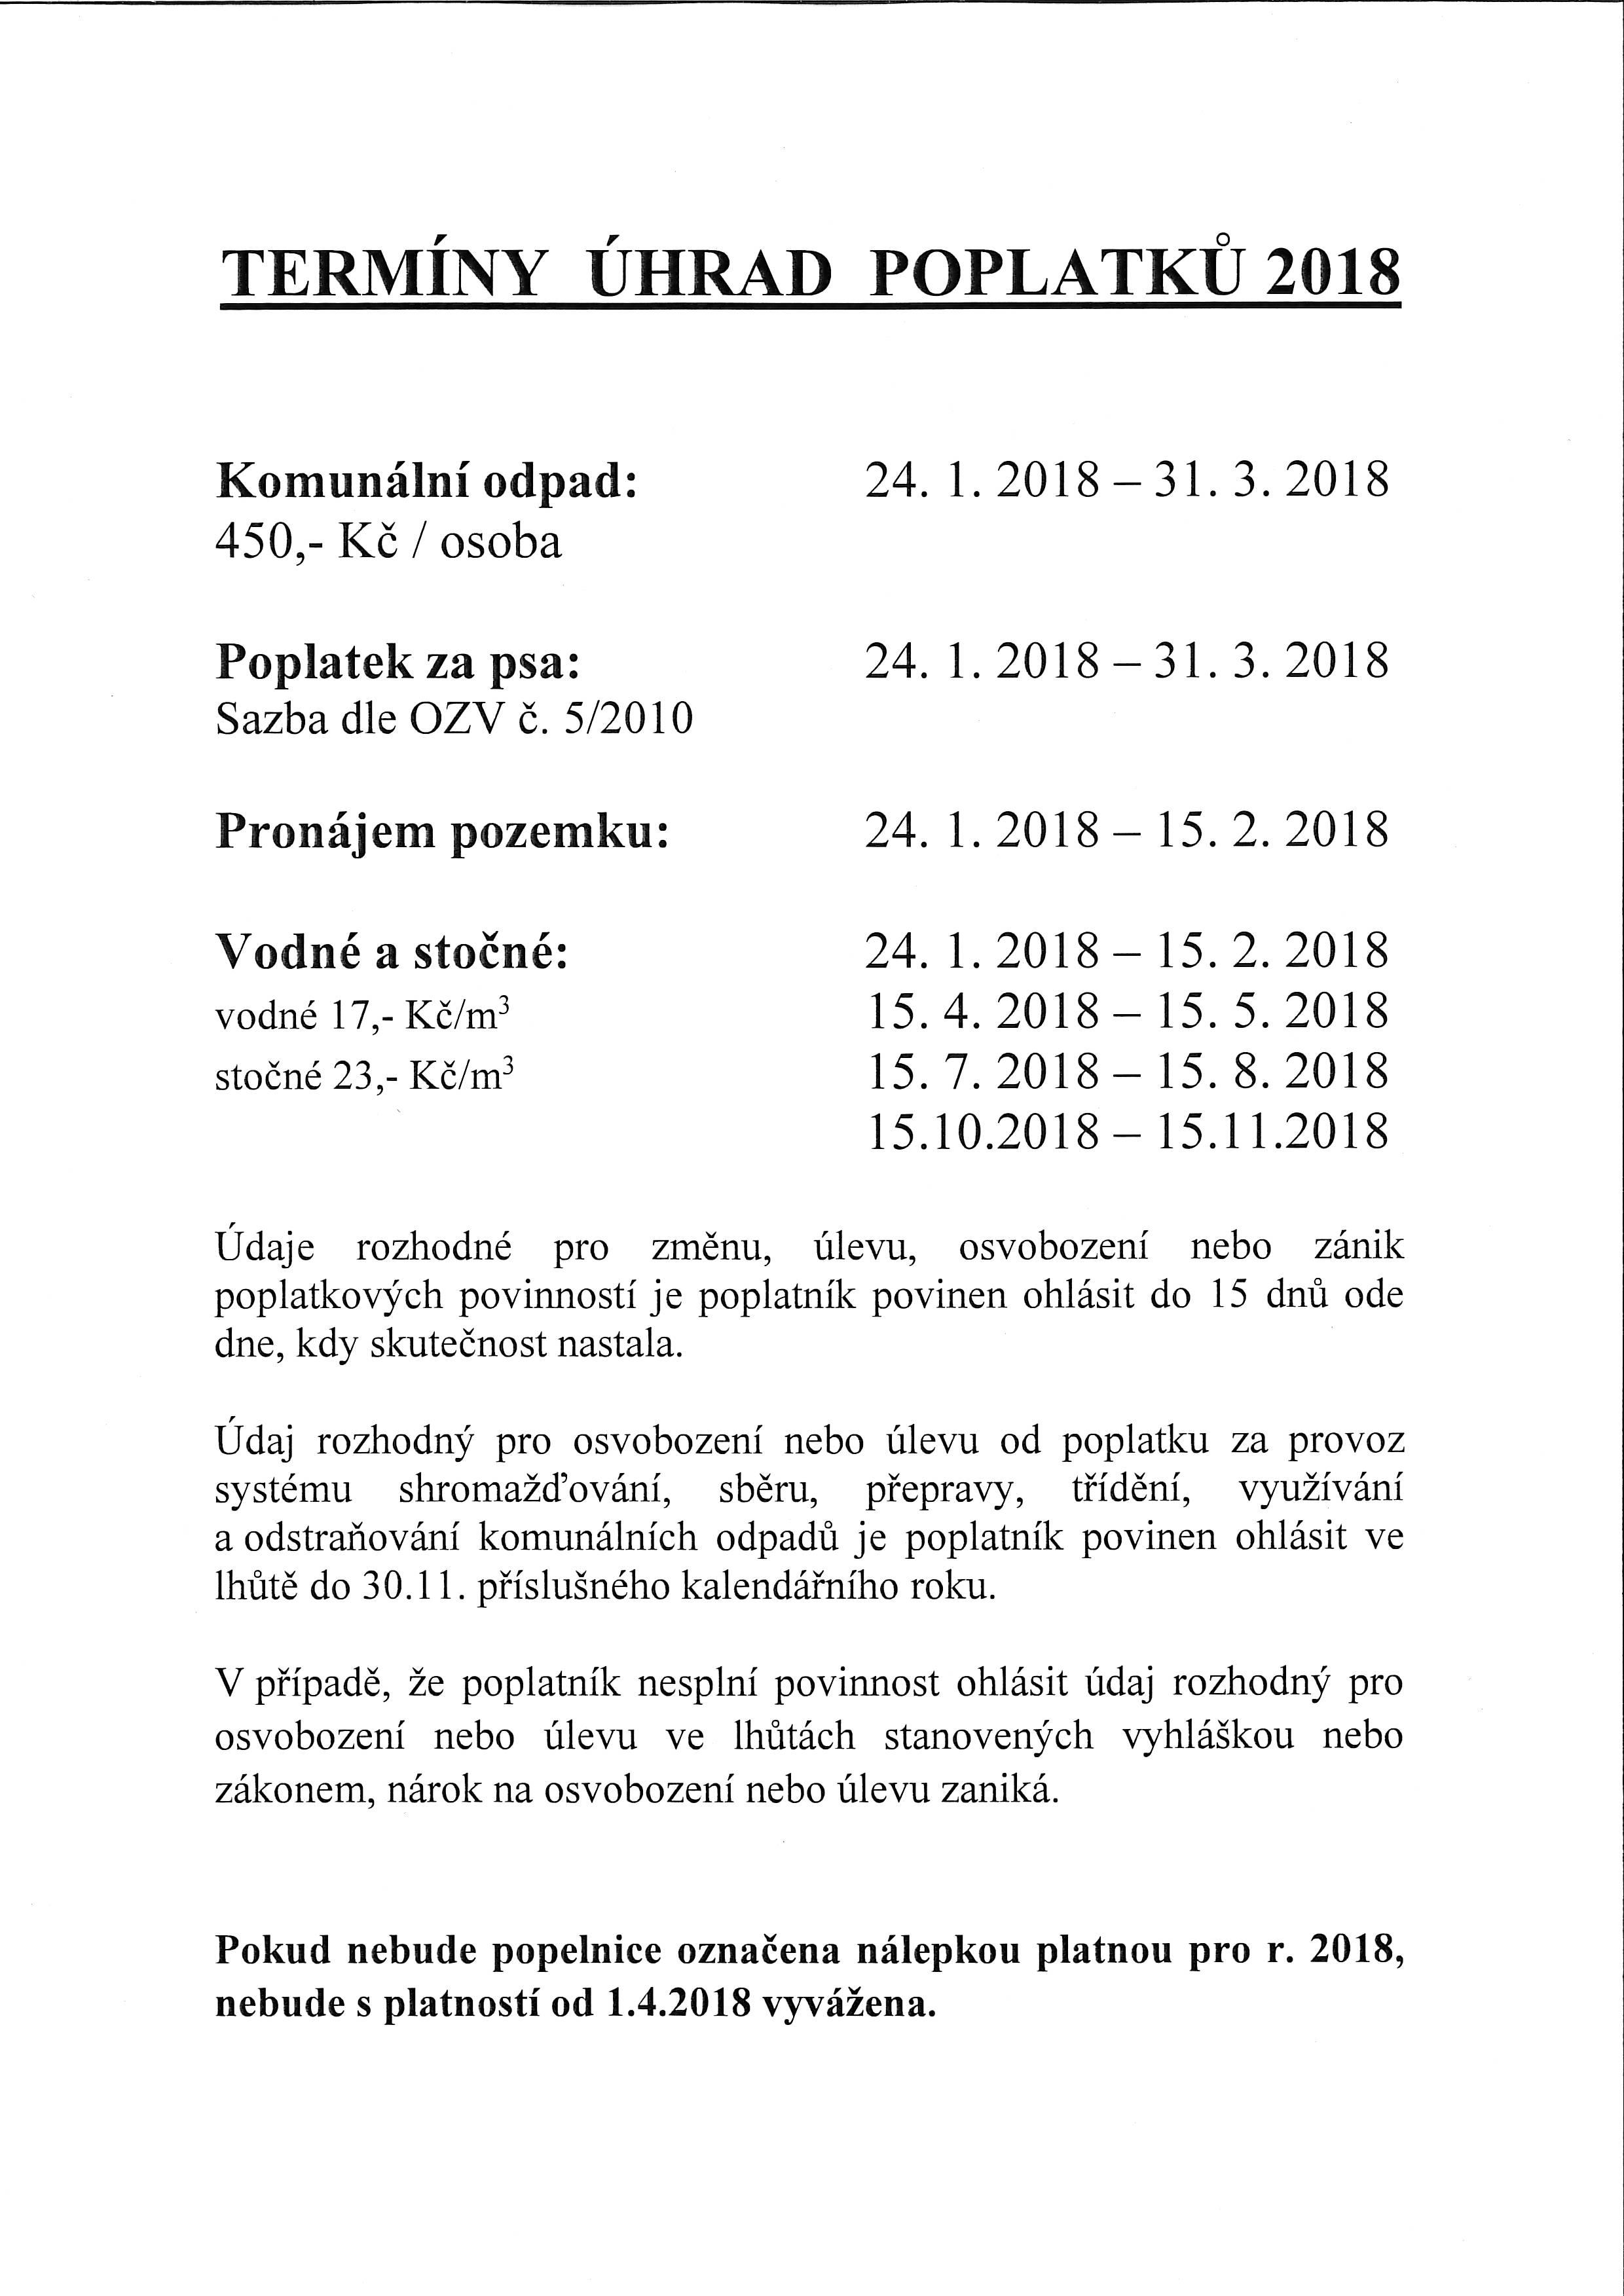 Termíny úhrad poplatků 2018